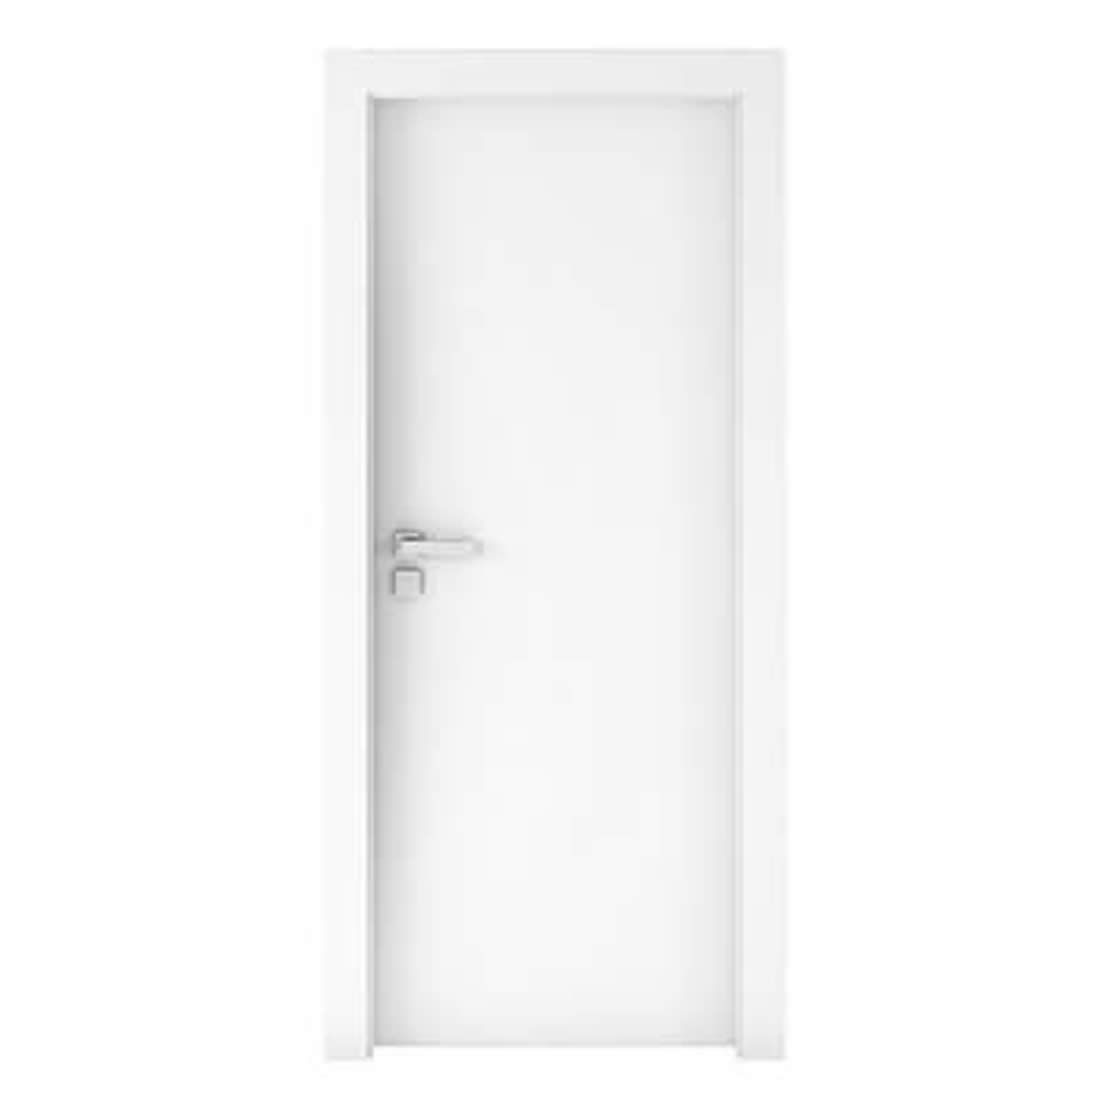 Kit Porta Concrem Wood 2,10 x 0,60 x 3,5 cm Direita Branca